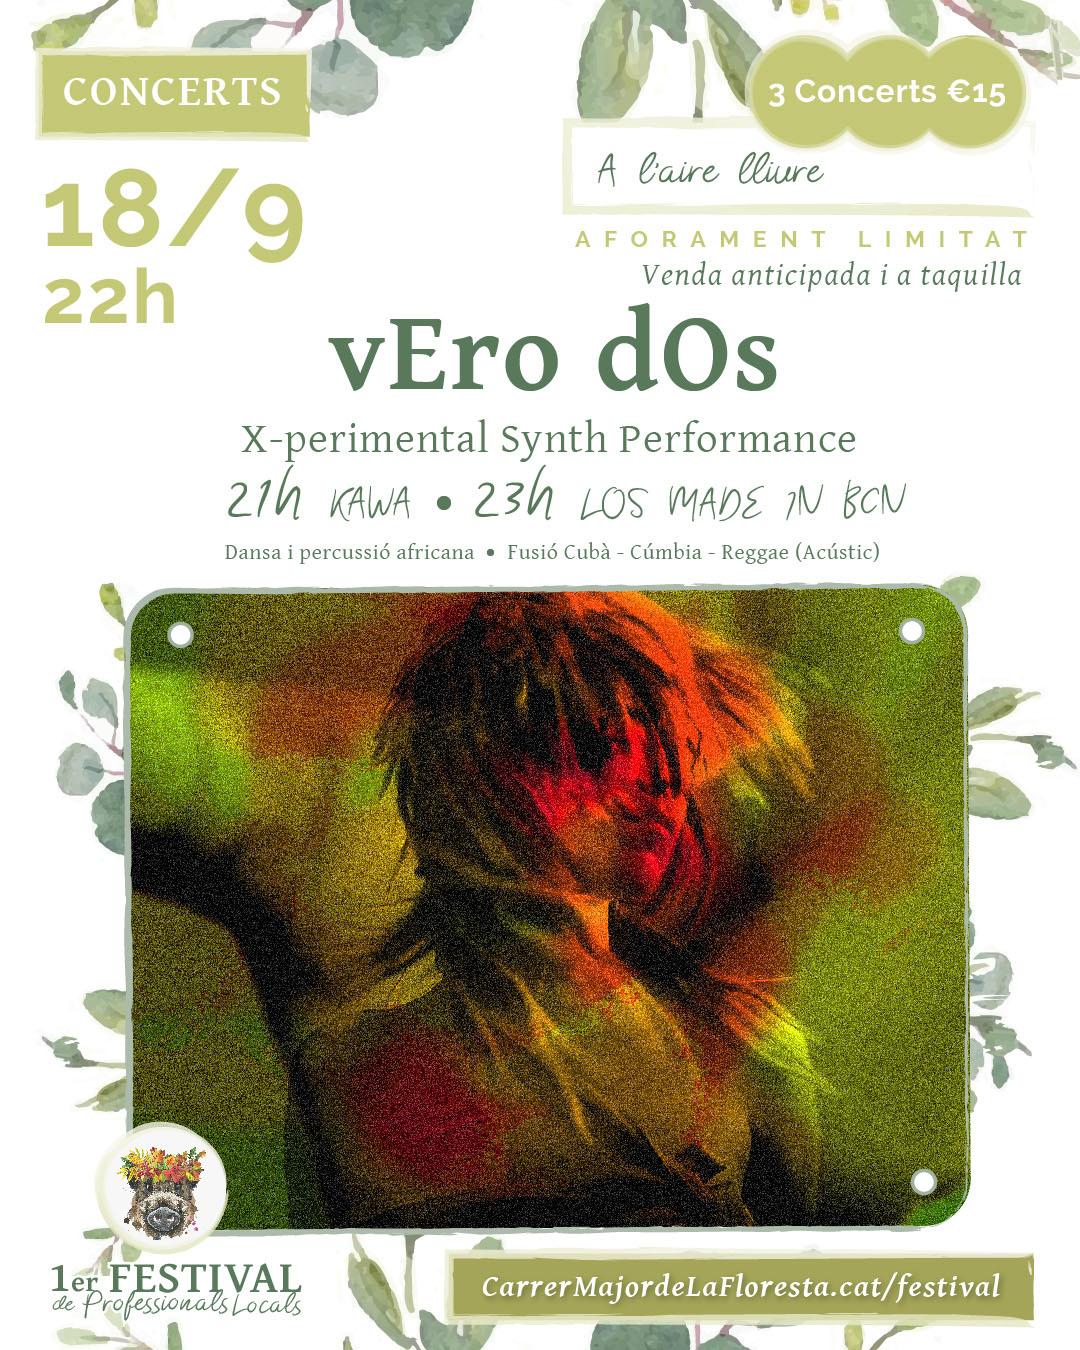 vEro dOs in concert